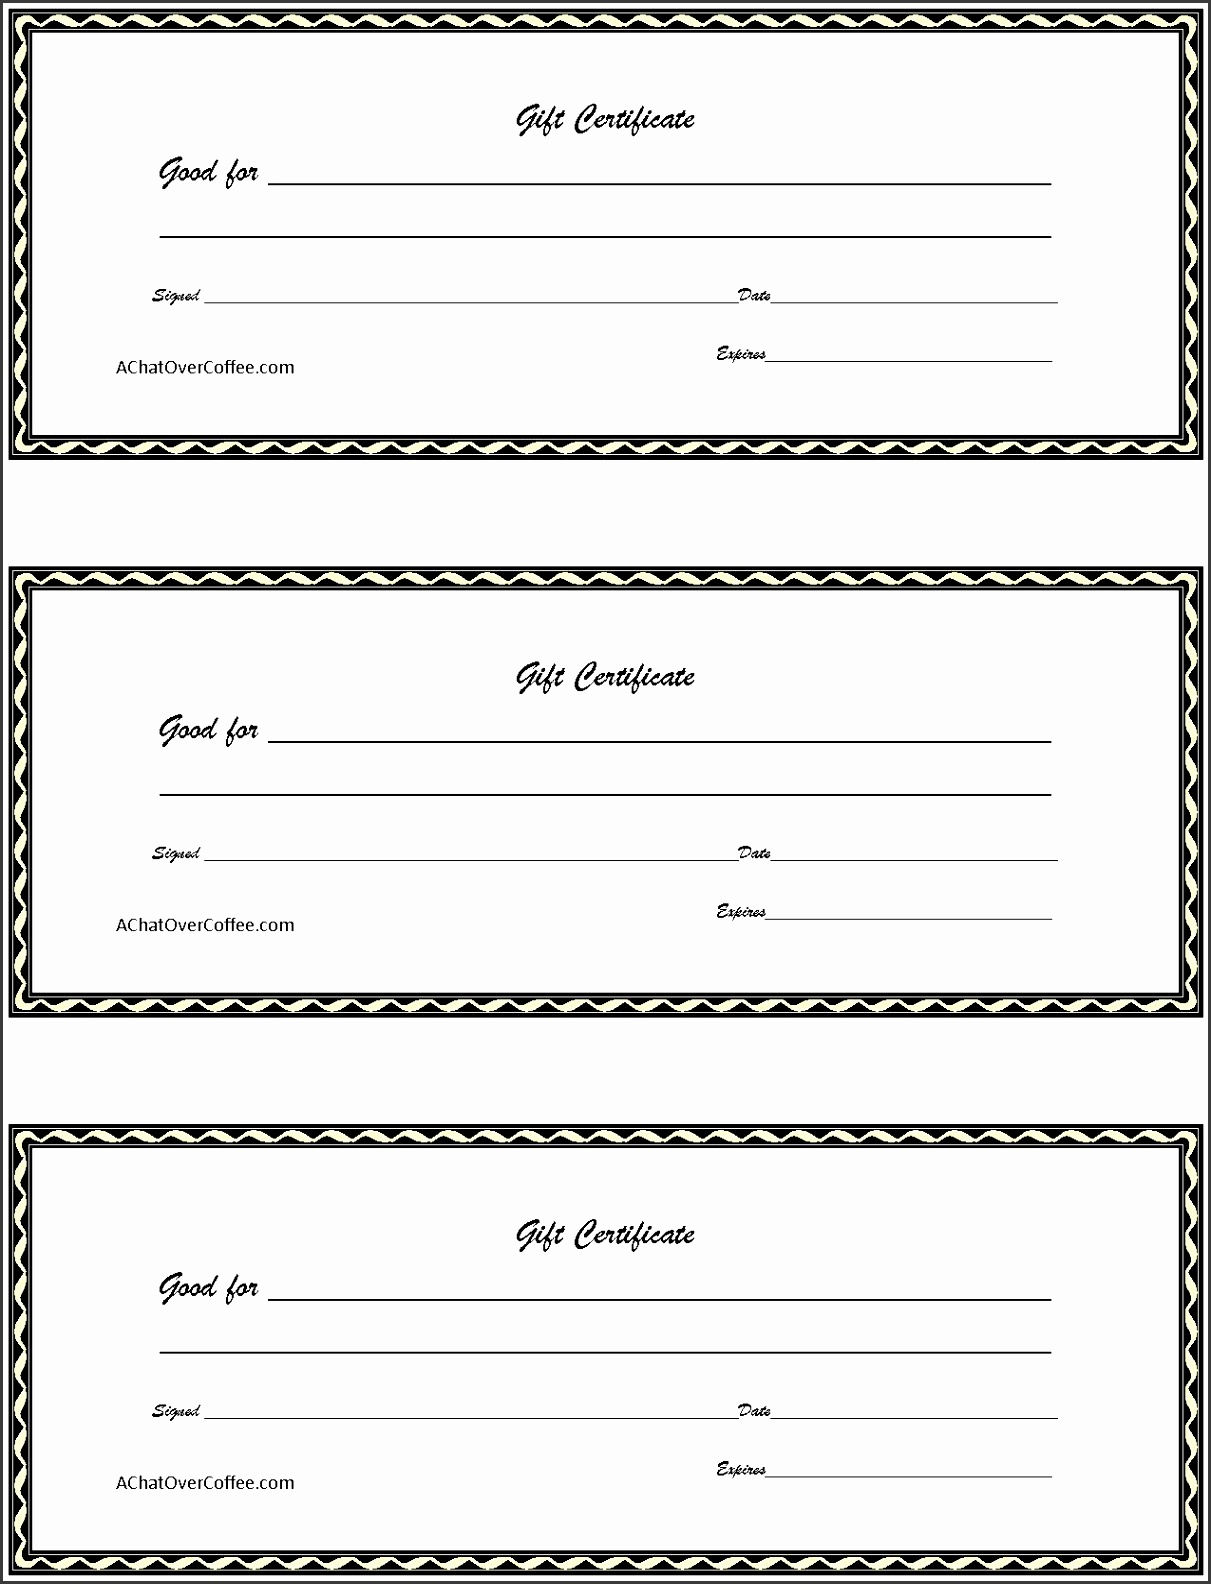 8 free printable gift vouchers sletemplatess sletemplatess